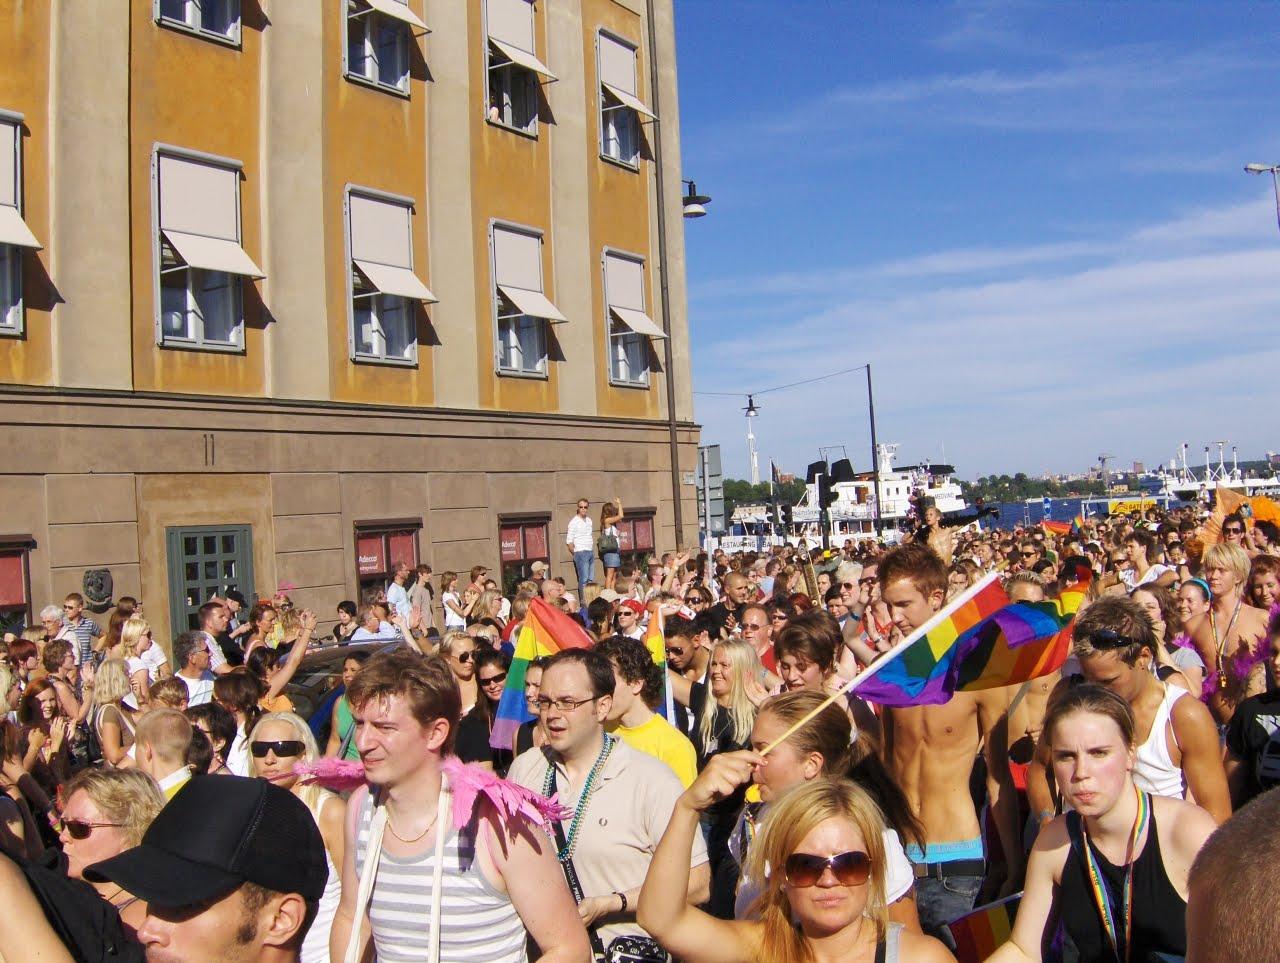 eskort farsta eskort trans stockholm gay